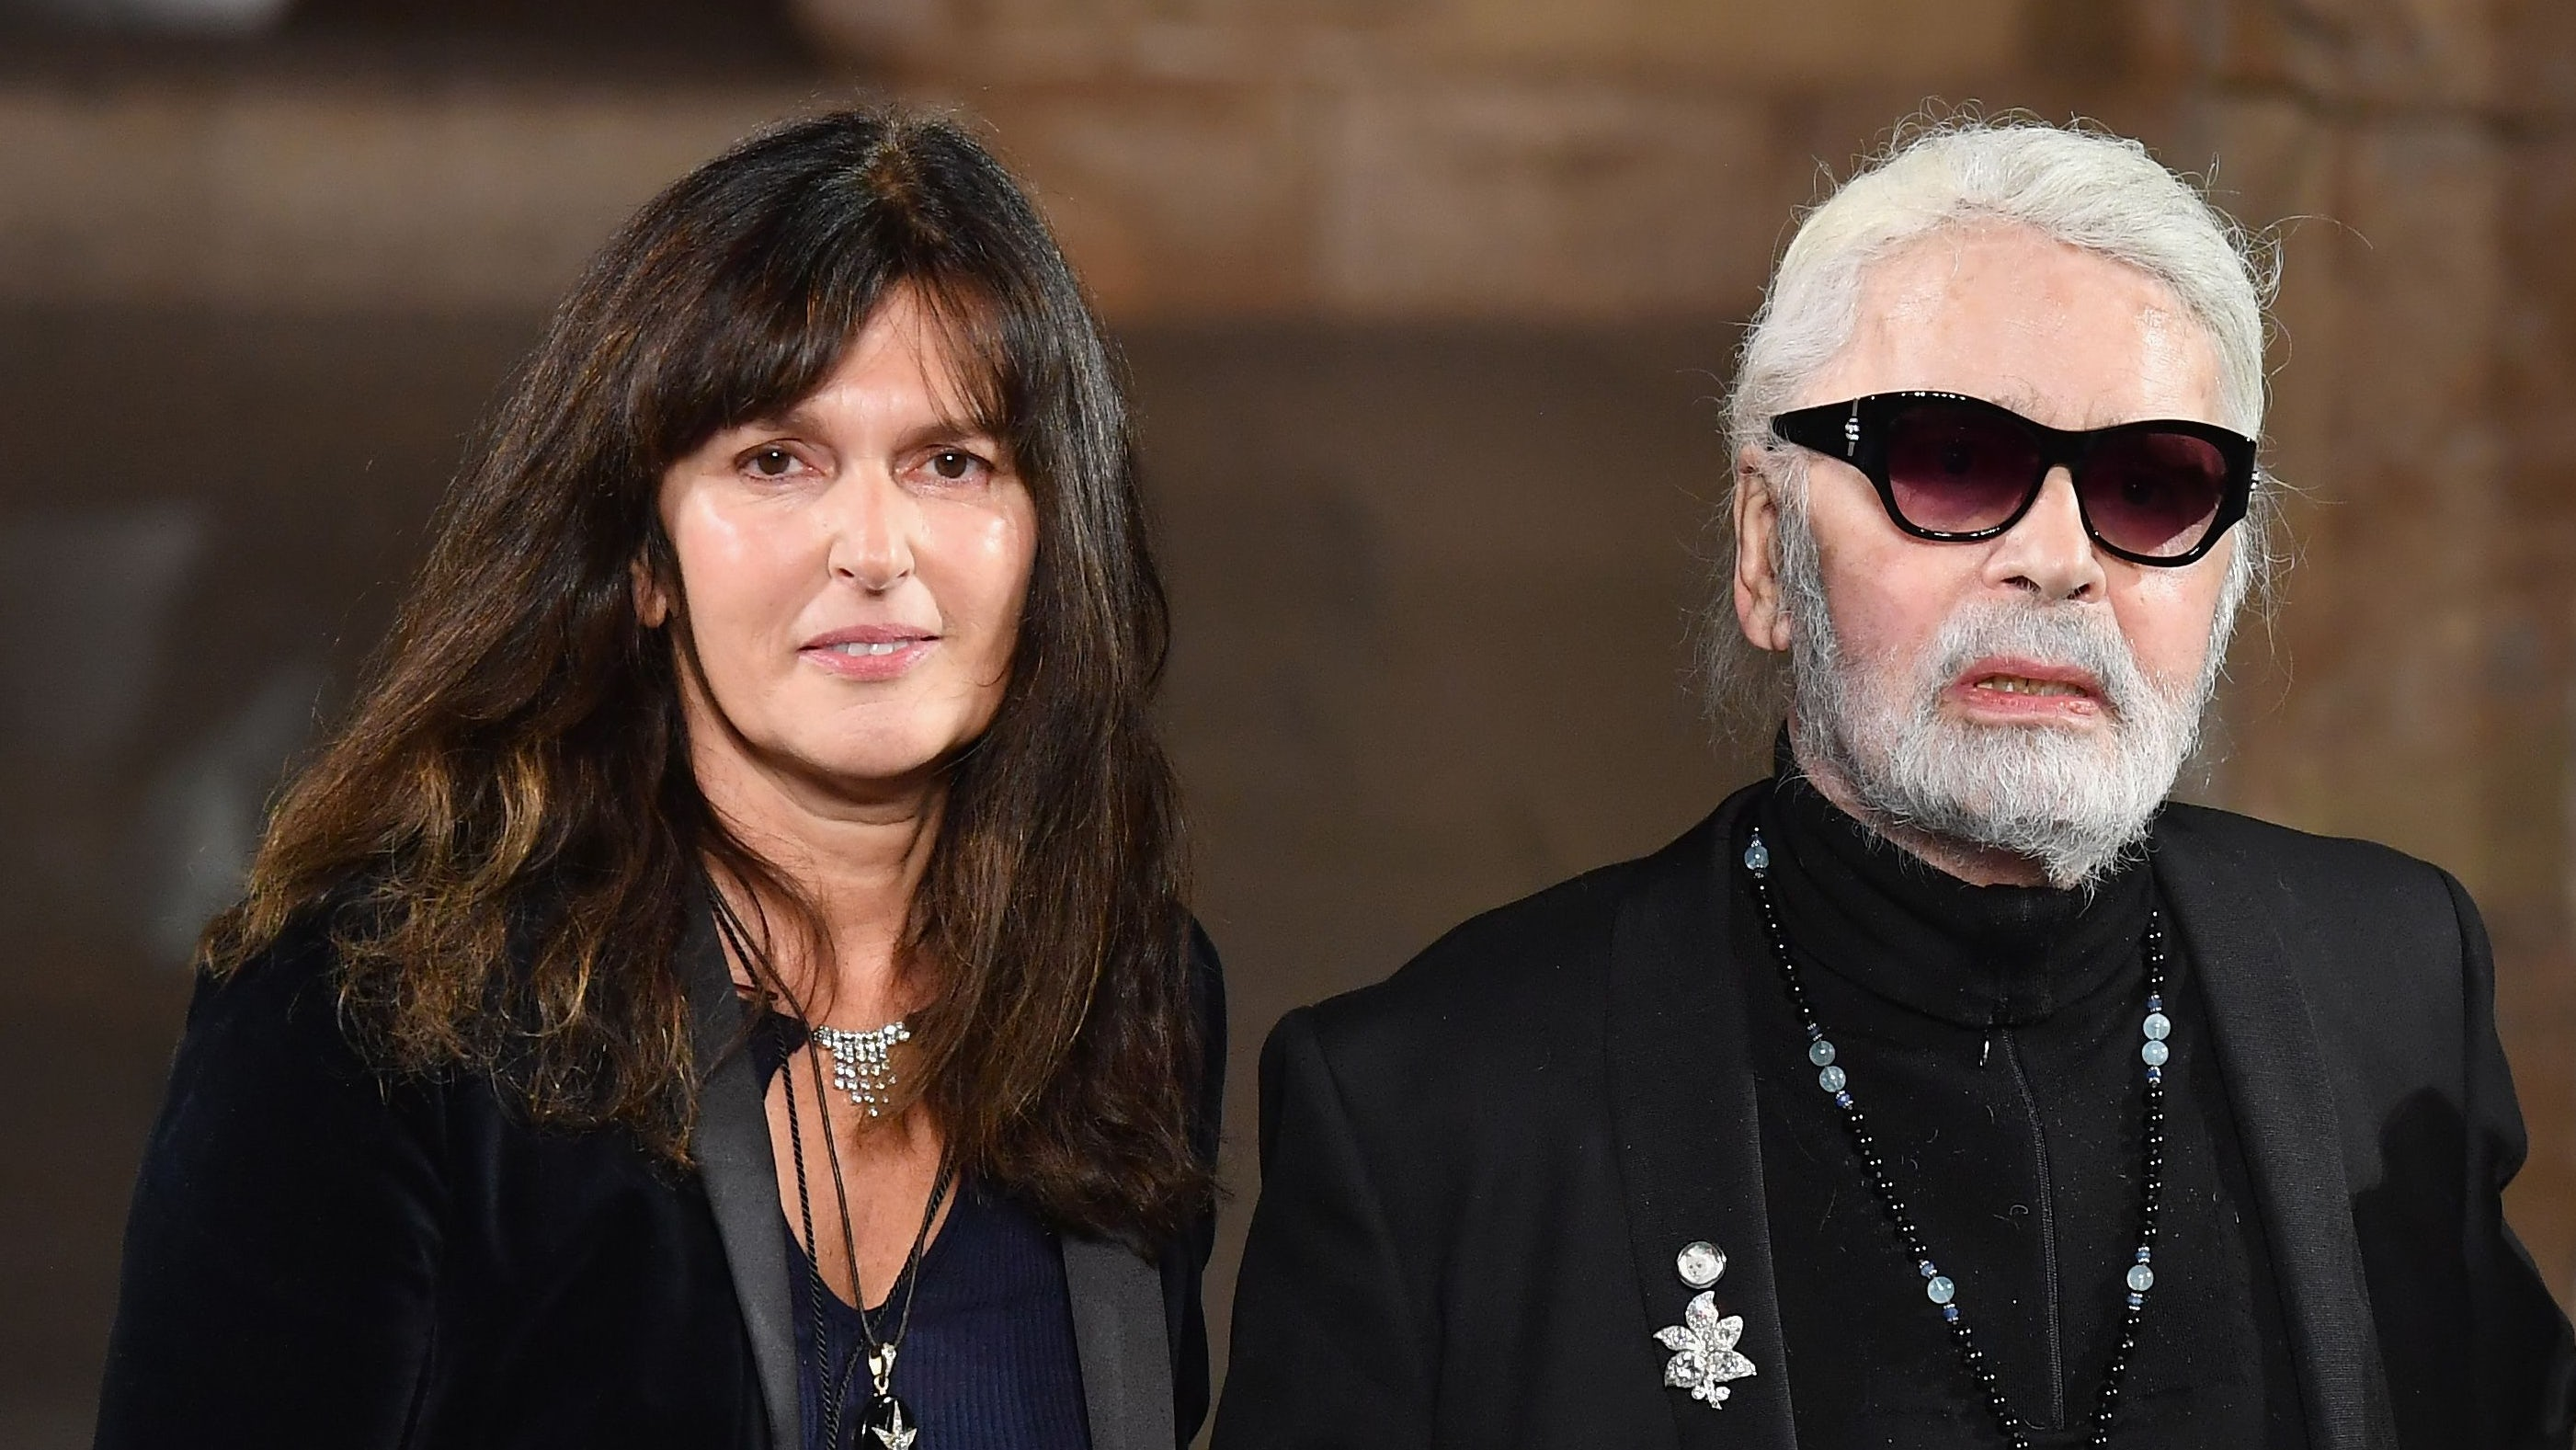 Virginie Viard e Karl Lagerfeld durante la mostra Chanel Metiers D'Art 2018/19 dicembre 2018 |  Fonte: Getty Images